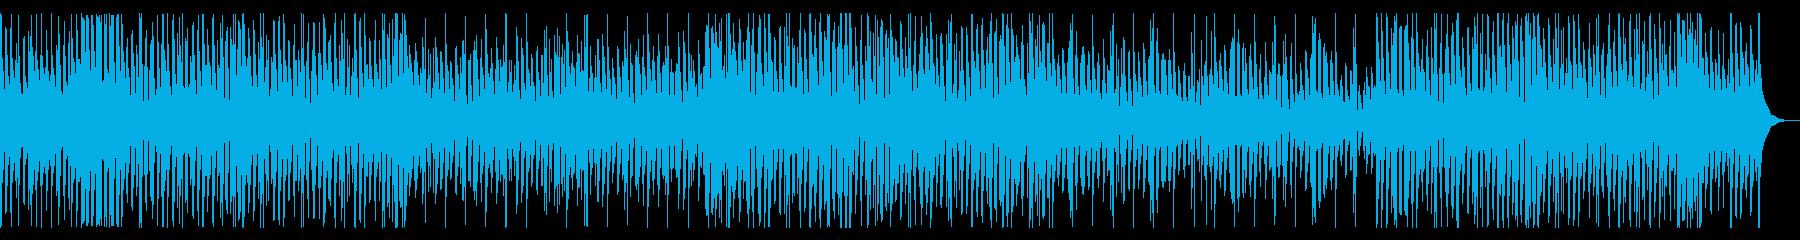 constructiveの再生済みの波形